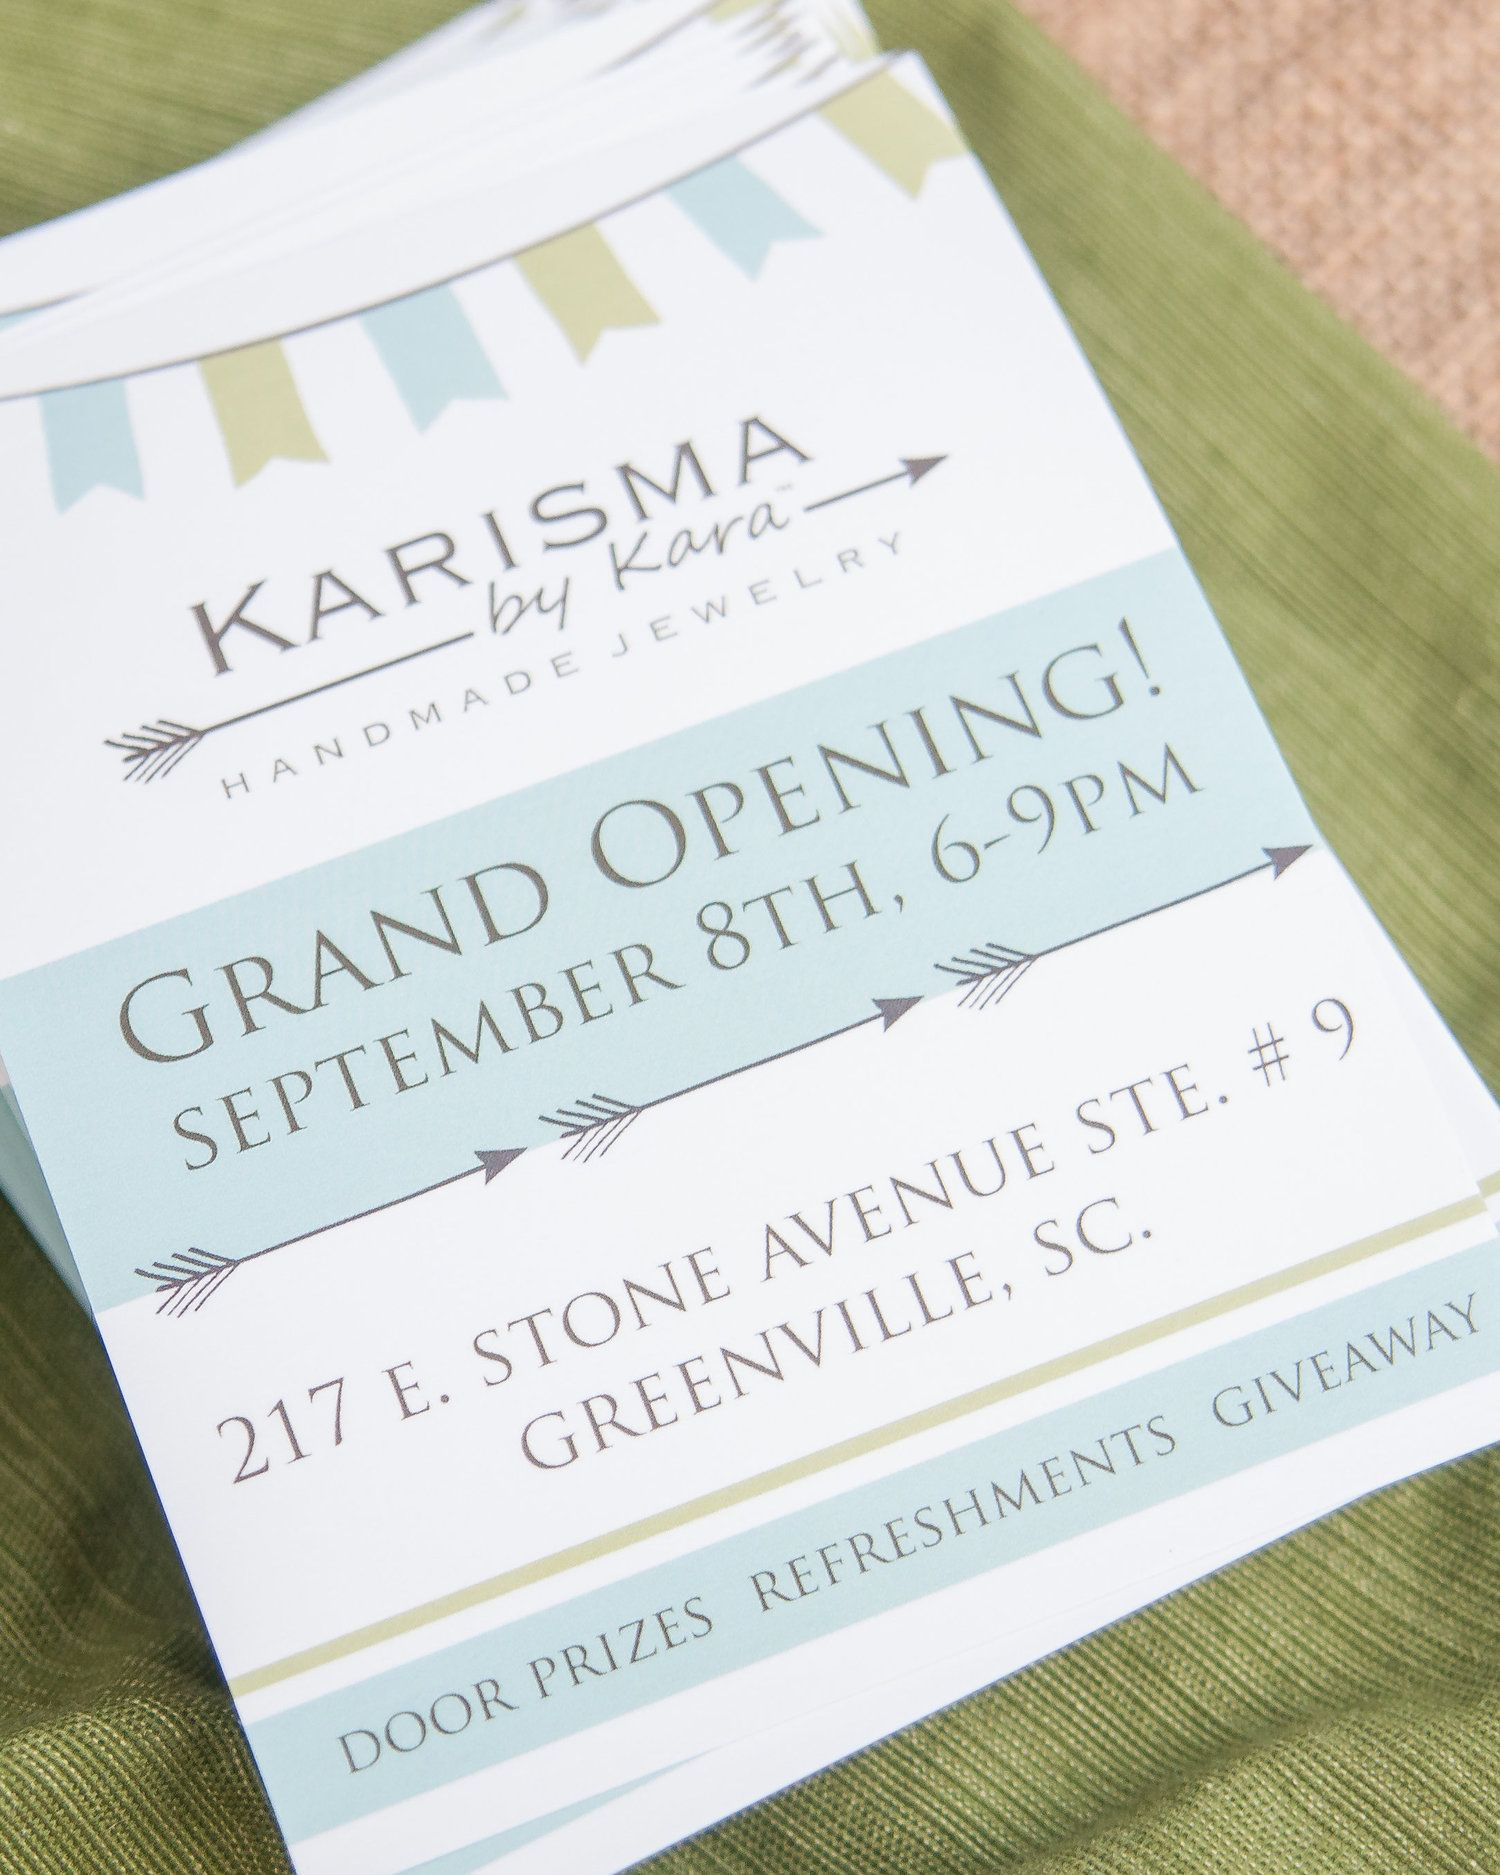 Karisma by KaraKarisma by Kara Jewelry | Greenville, SC | Pinterest ...